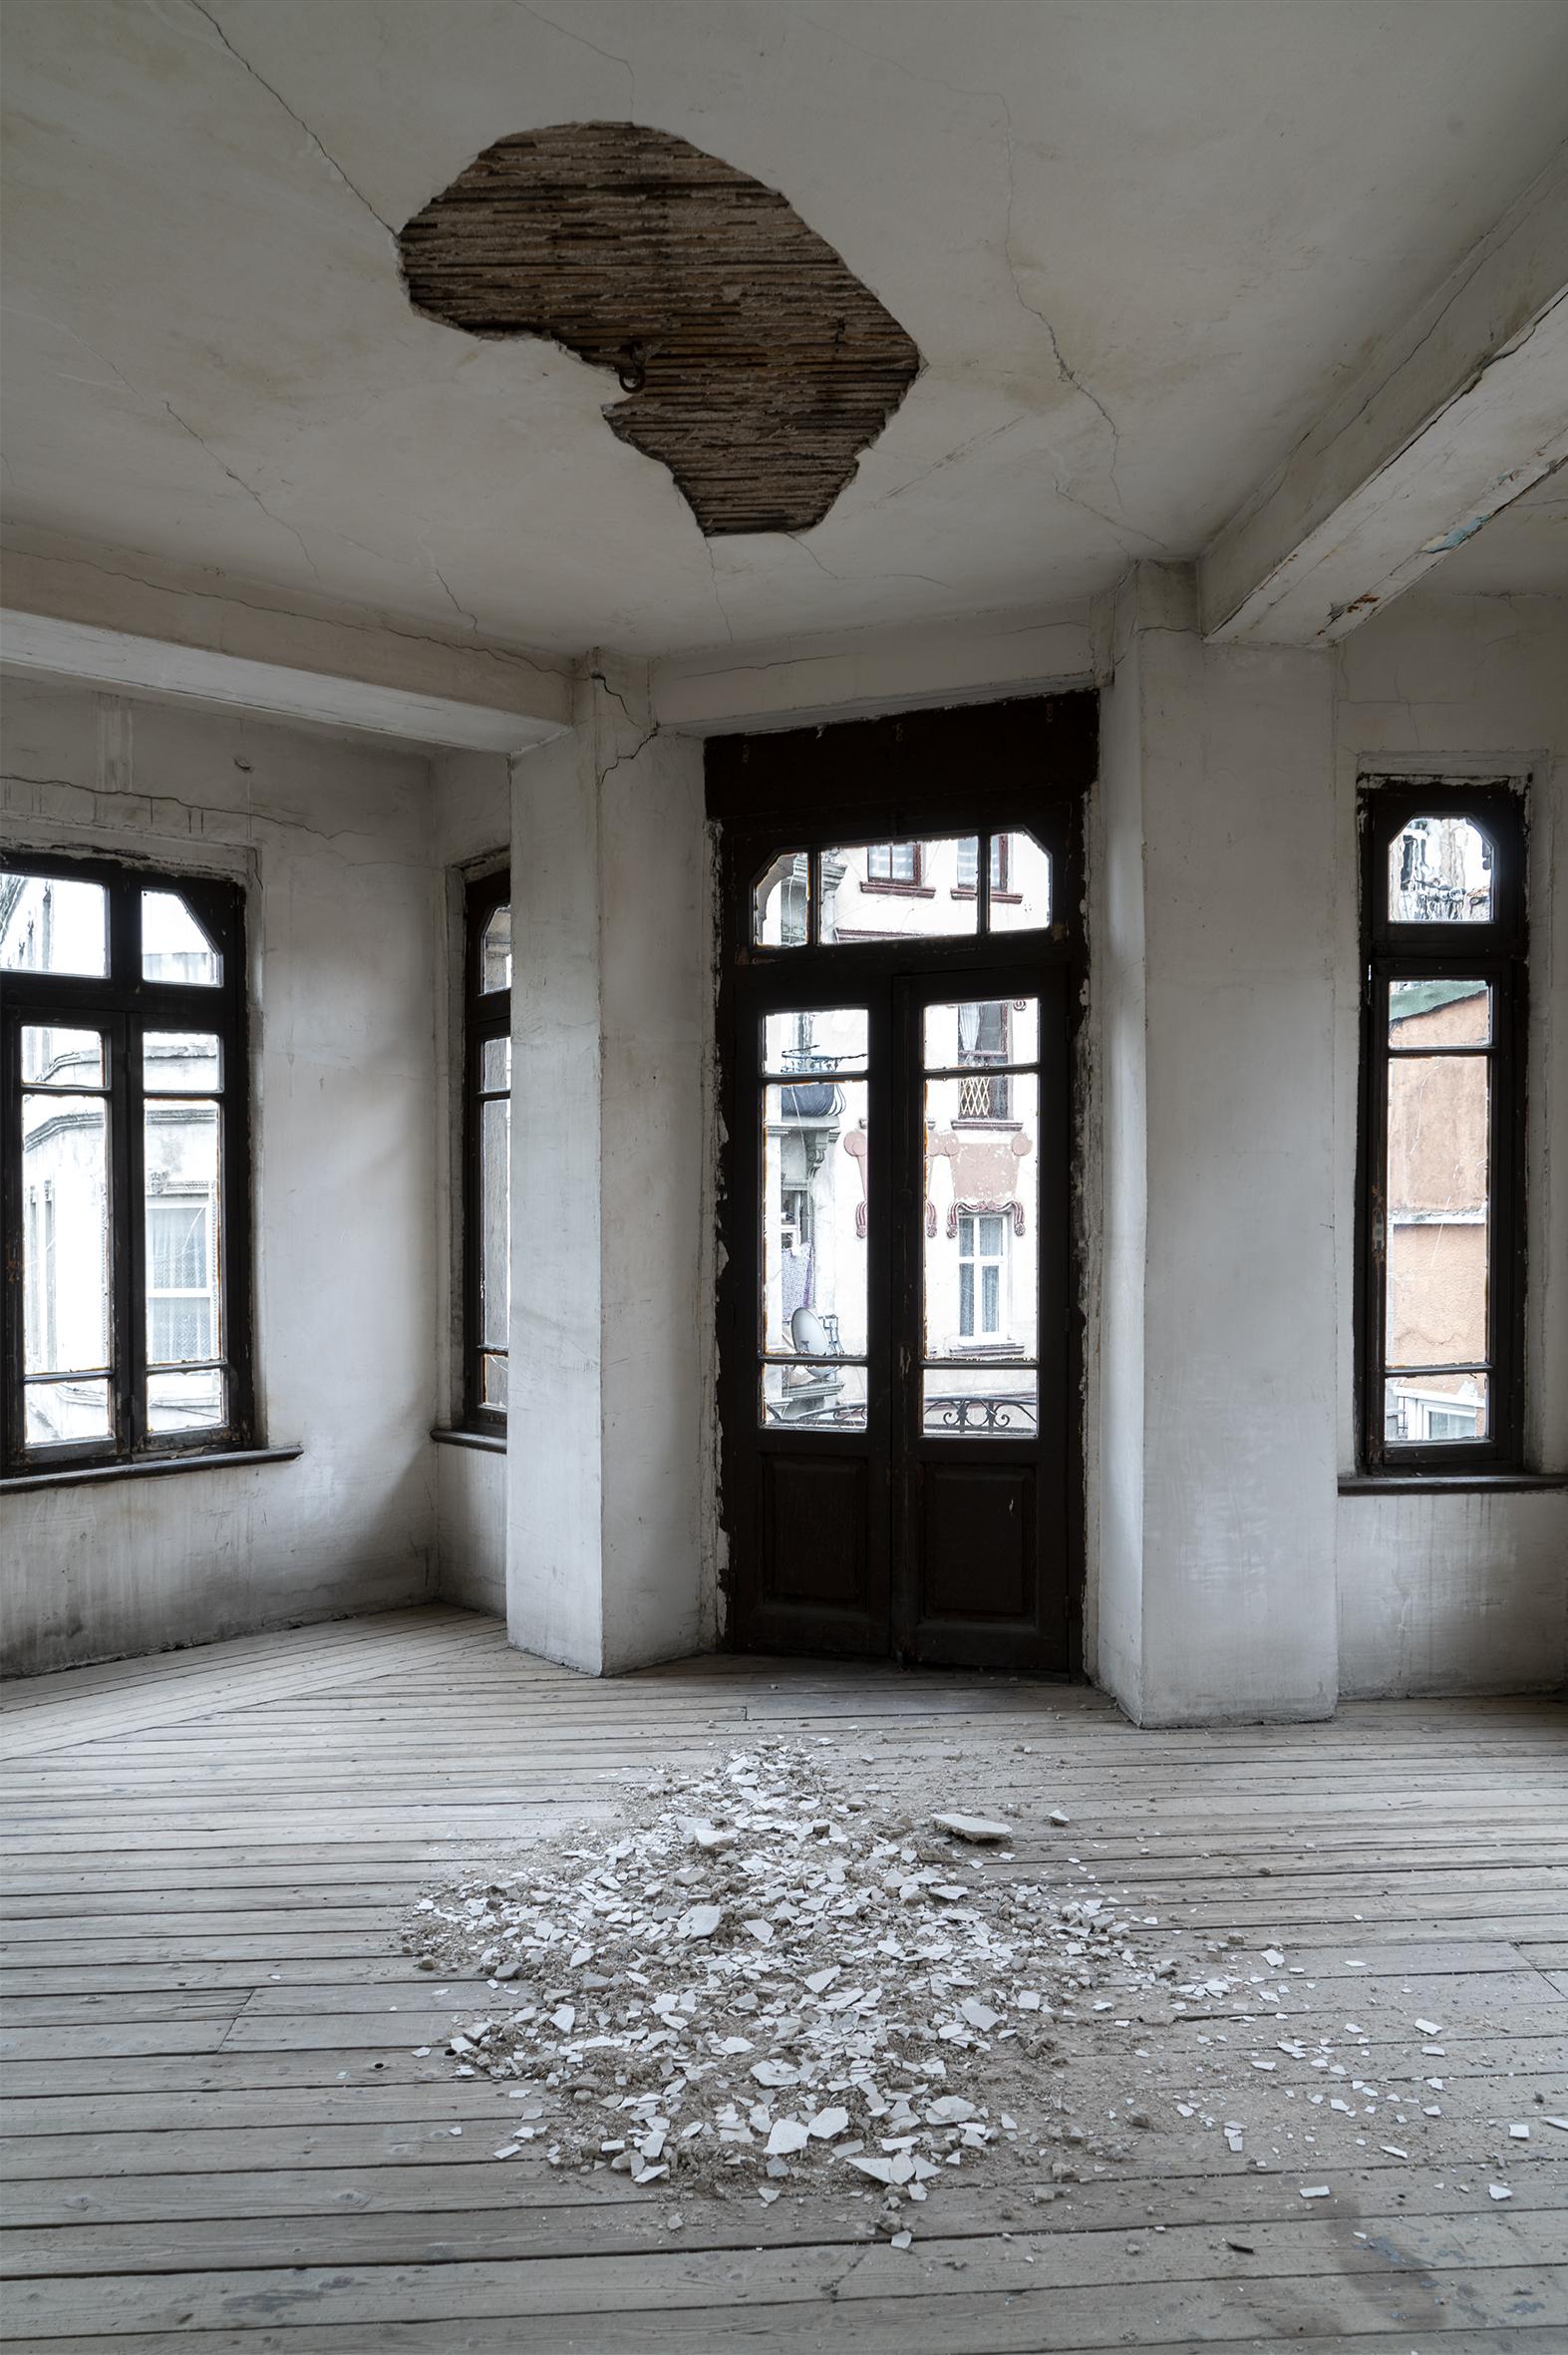 Gian-Maria-Tosatti-Kalbim-Ayna-Gibi-Bos-–-Istanbul-Bolumu-2021-6